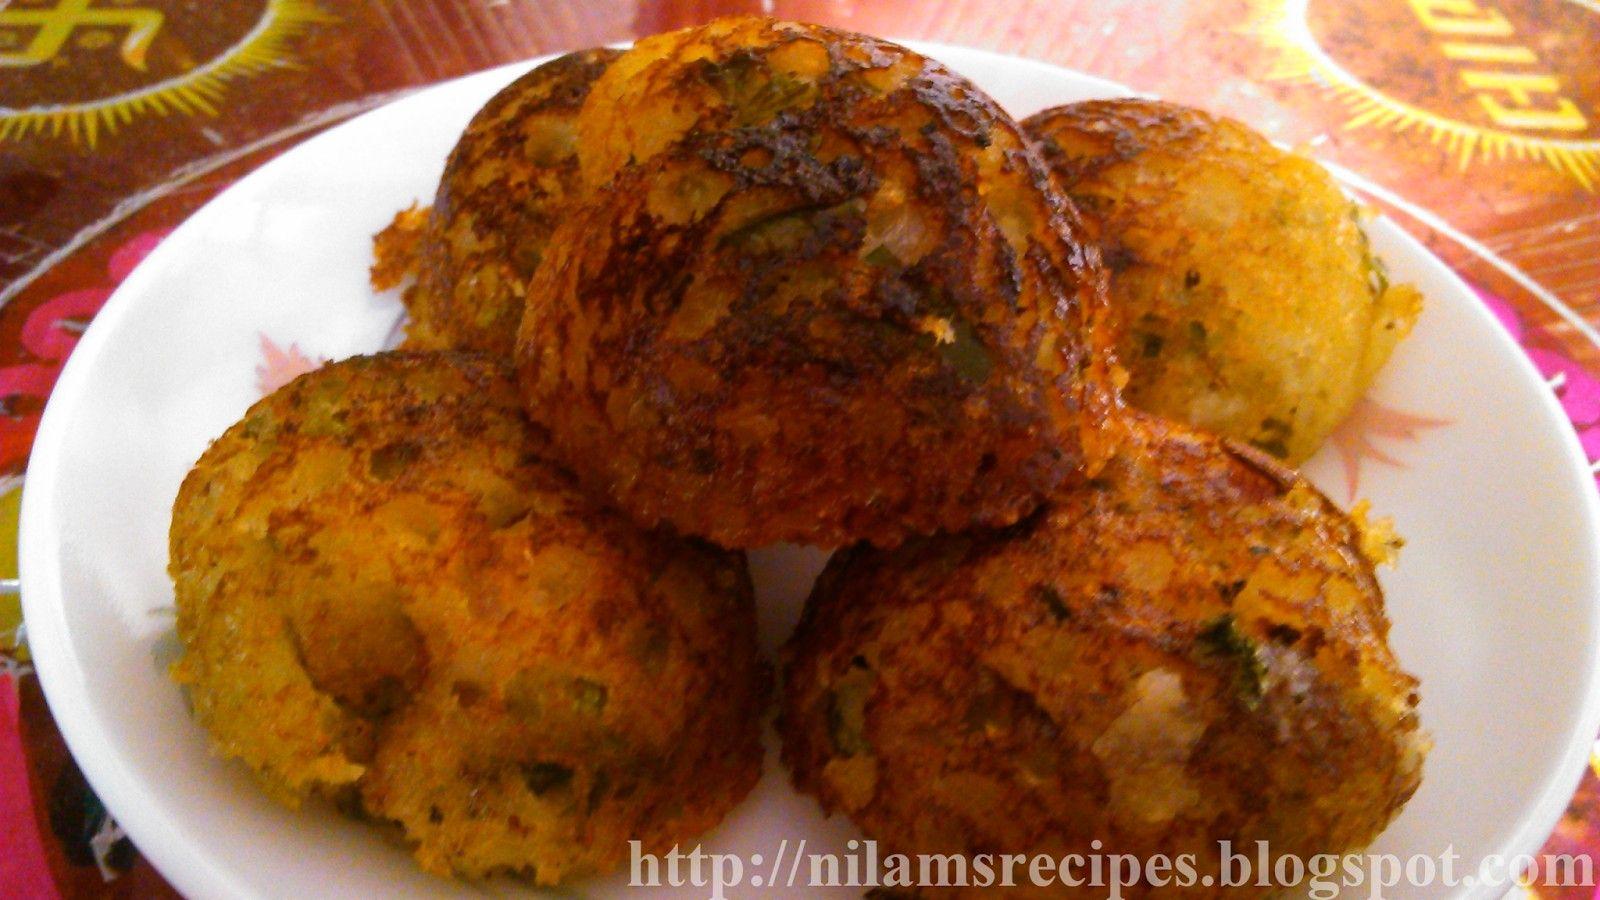 Instant appe maharashtrian recipes lunch instant appe maharashtrian recipes forumfinder Choice Image